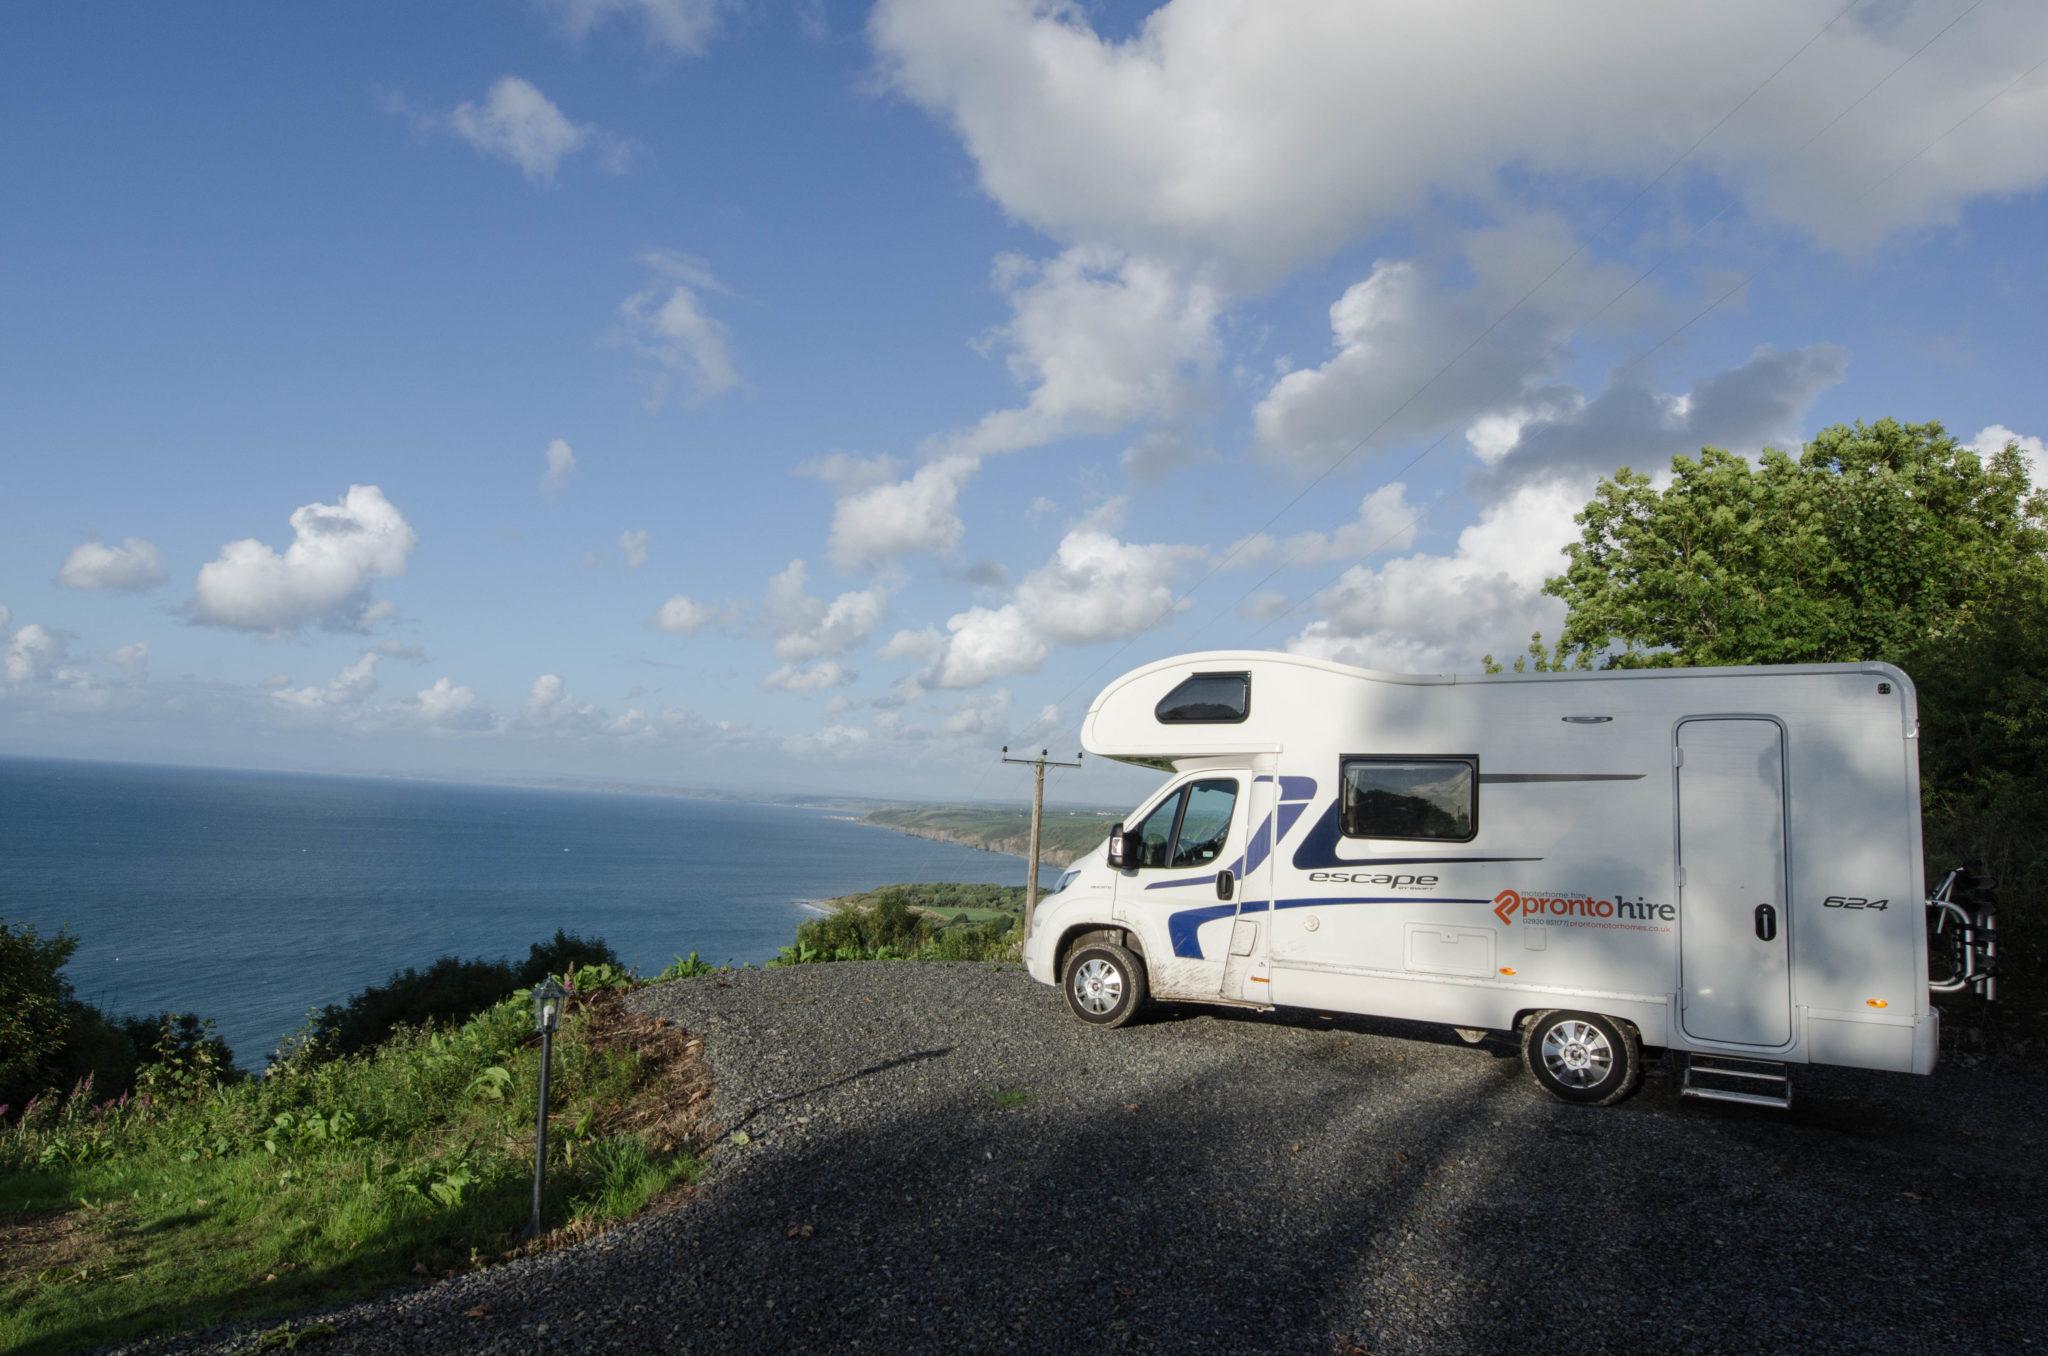 Camping in Wales klappt super